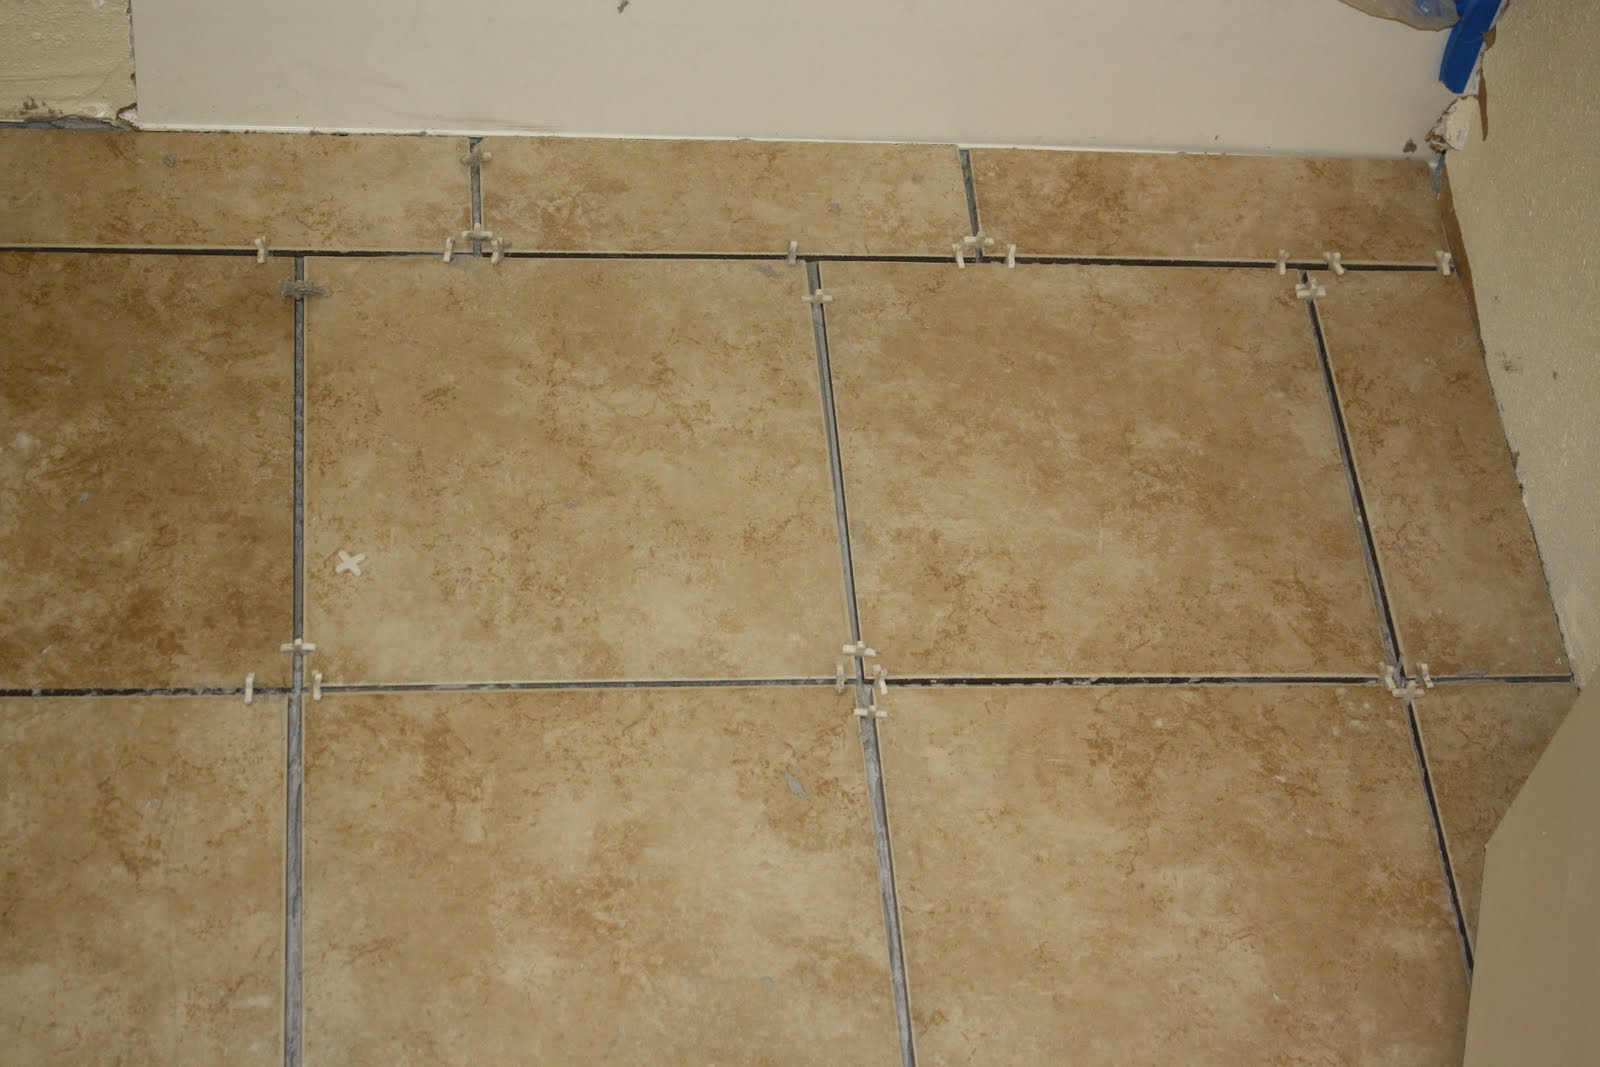 chelsea joshua avalinea olivia floor tile in basement bathroom